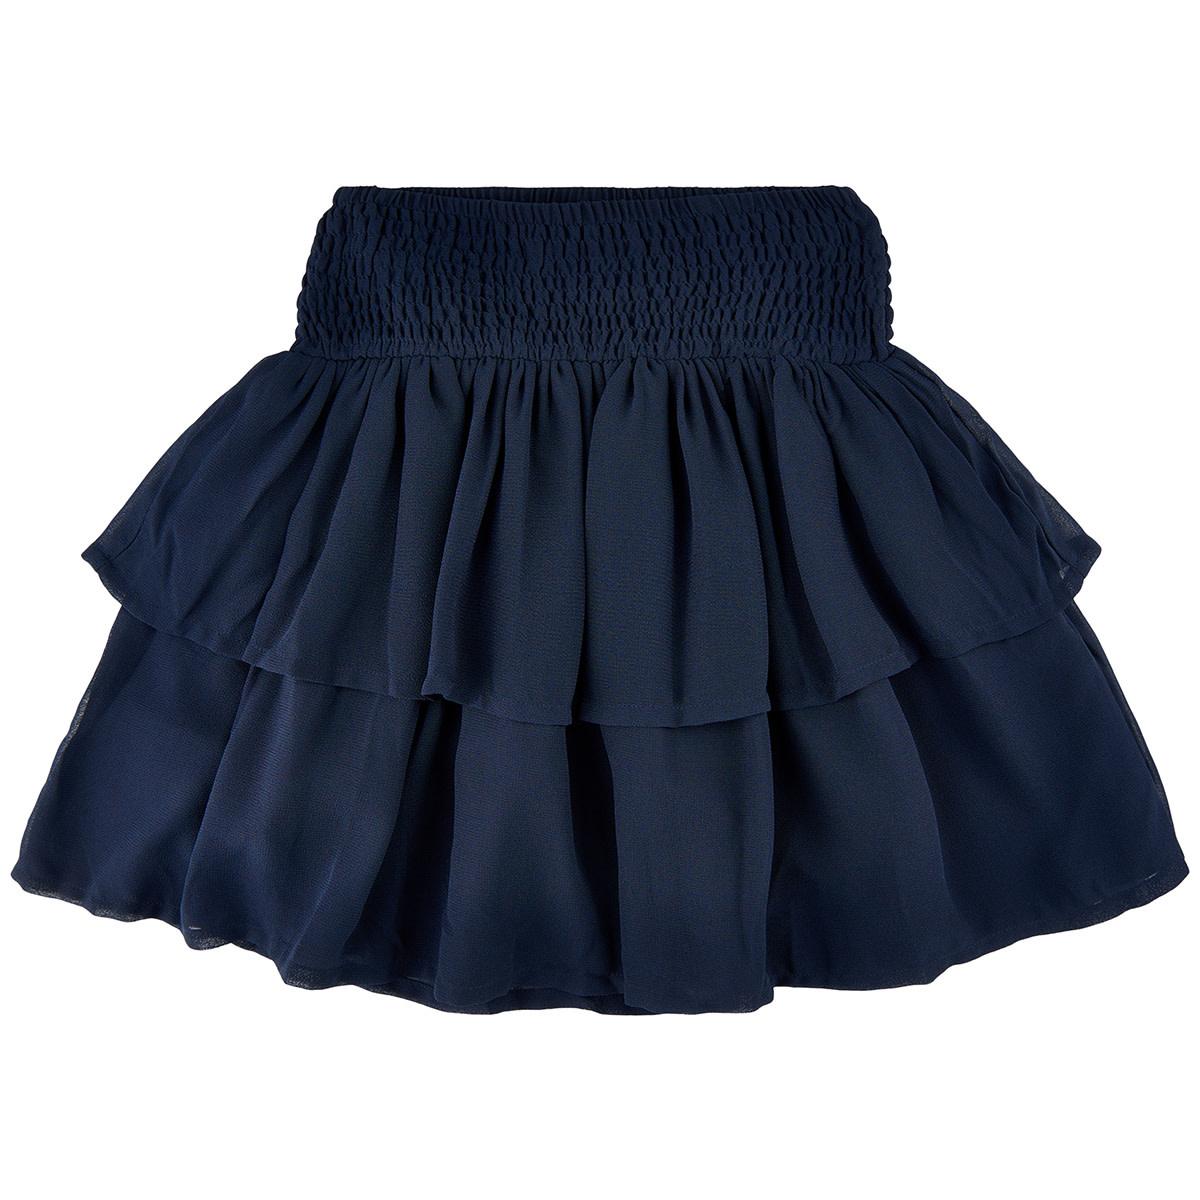 Thora Skirt